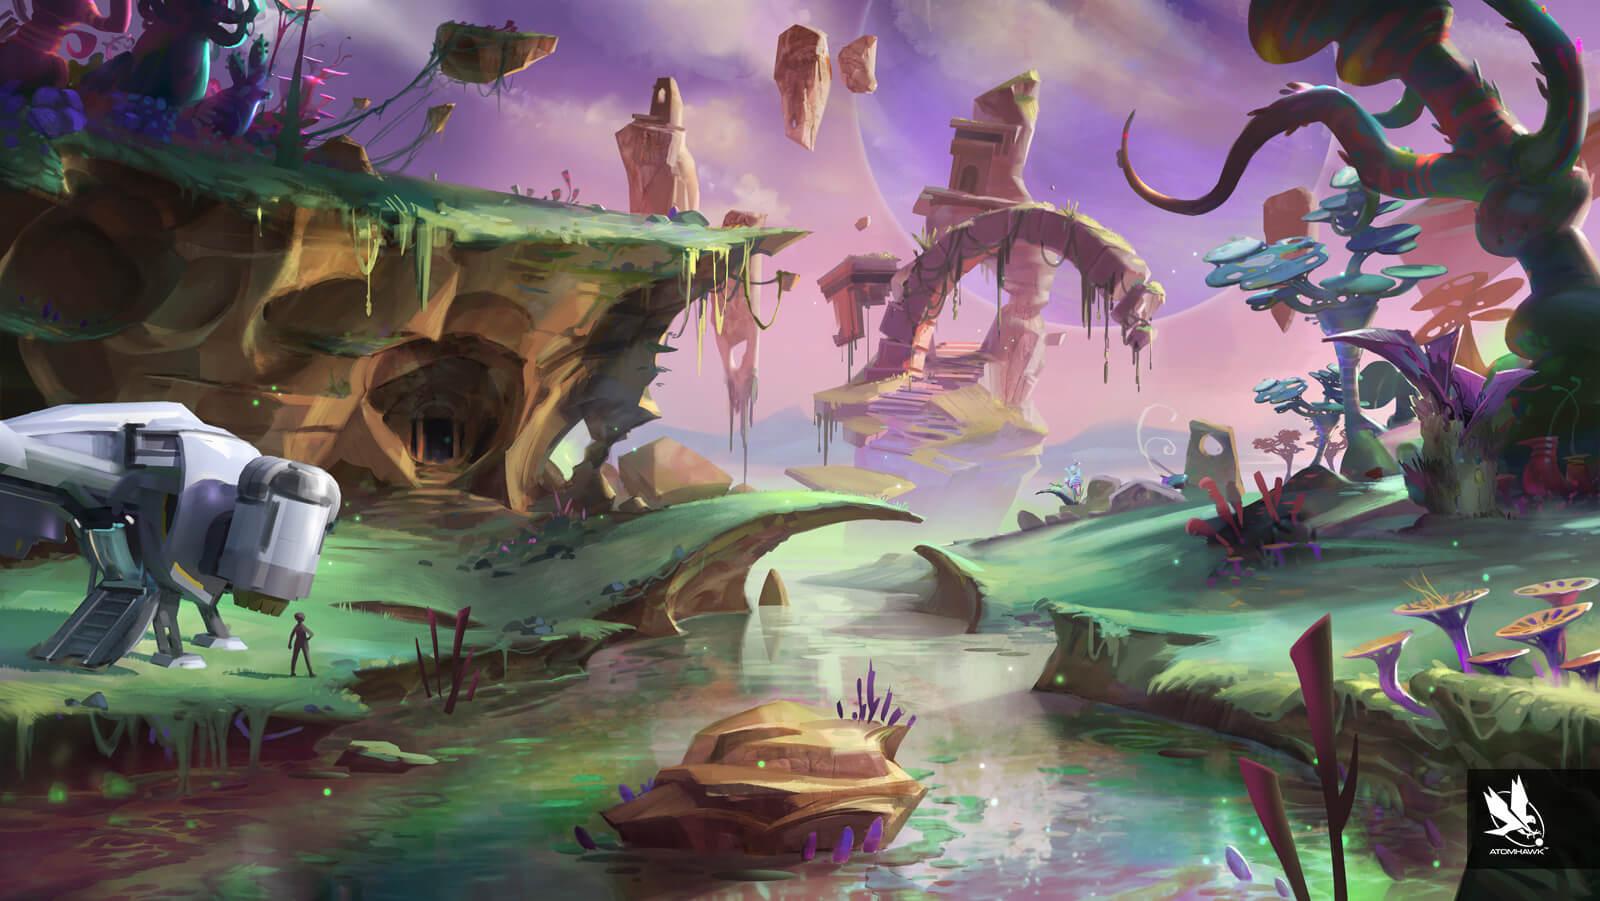 Atomhawk_Unity_3D-Game-Kit_Concept-Art_Environment-Design_Alien-Planet-3.jpg